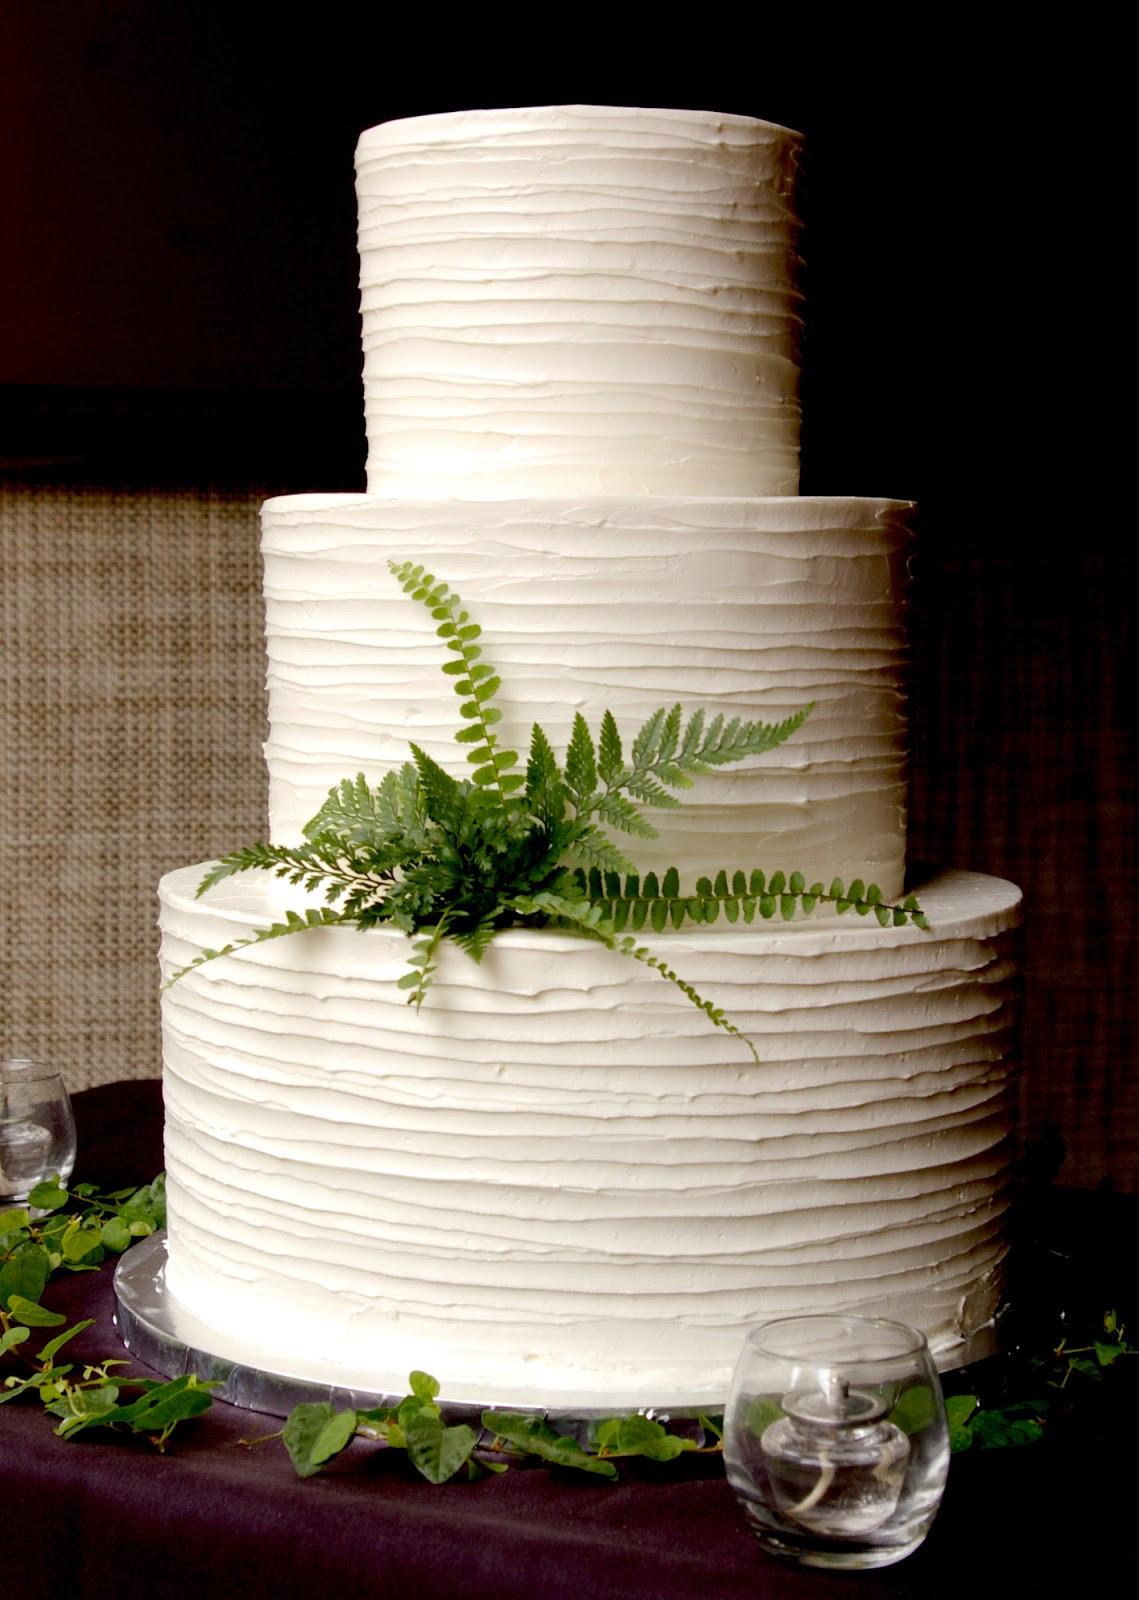 Plain White Wedding Cakes  These Peas are Hollow Buttercream Beauties